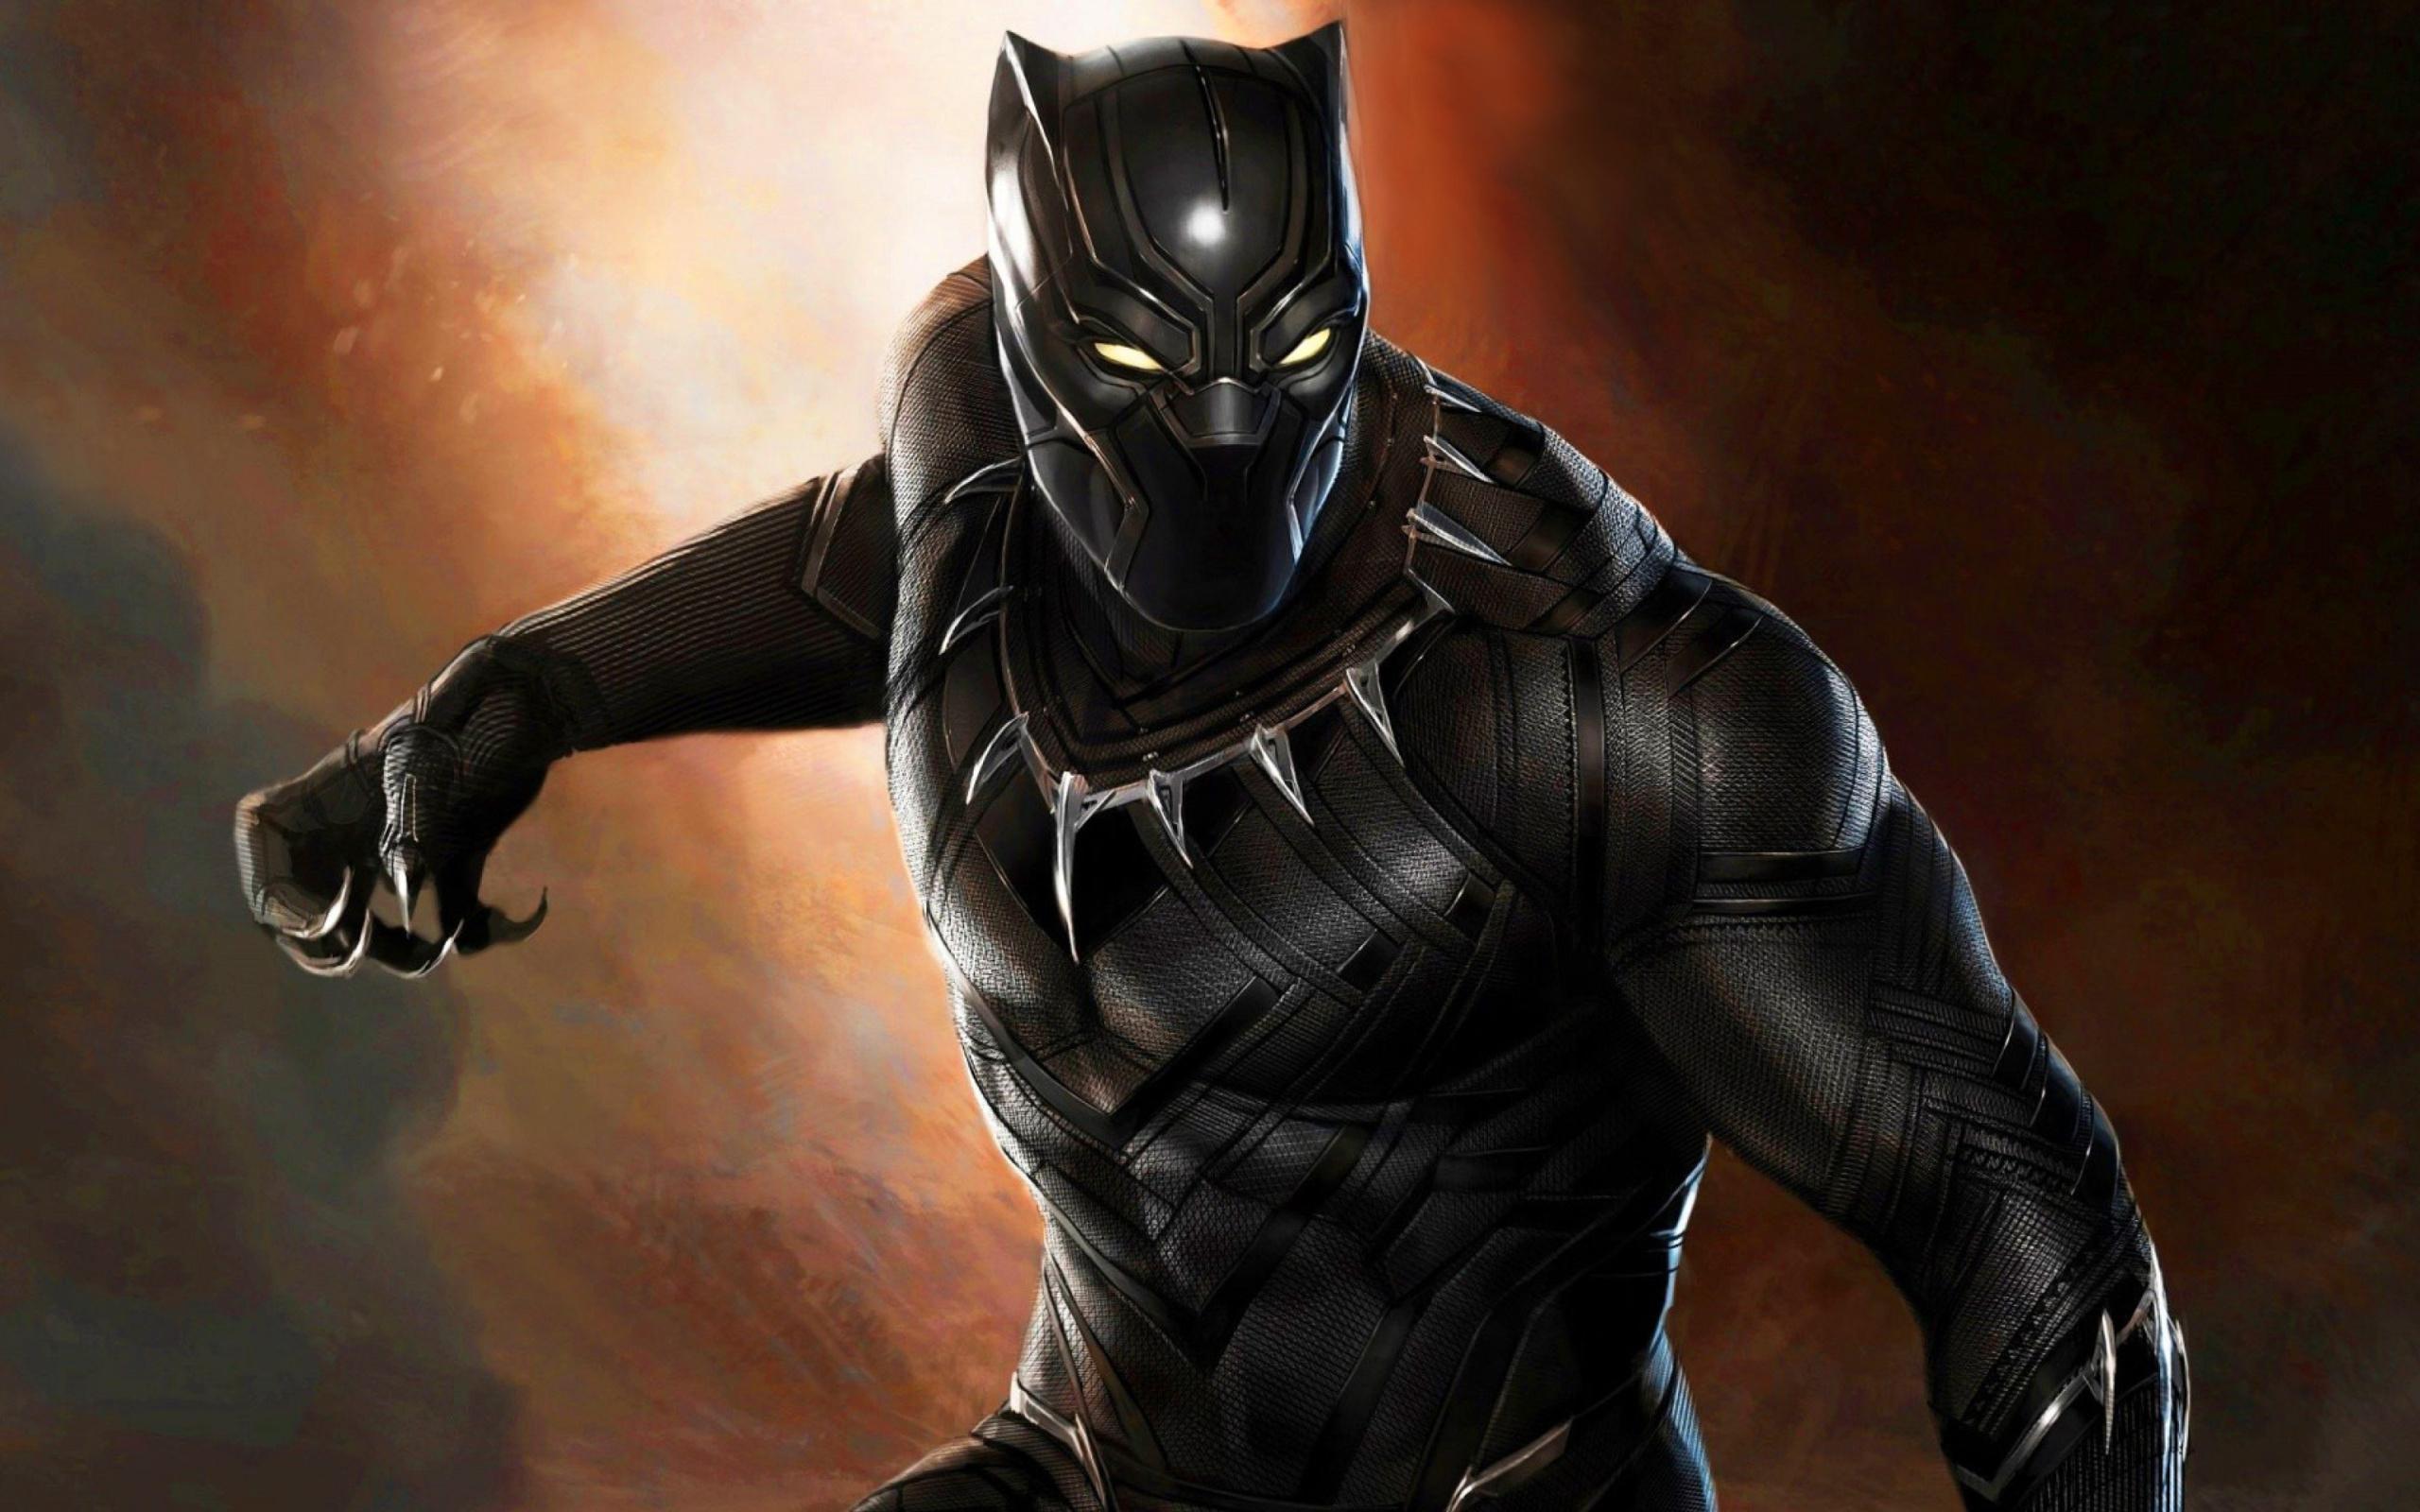 Koleksi Wallpaper Superhero Black Panther | HD Wallpaper